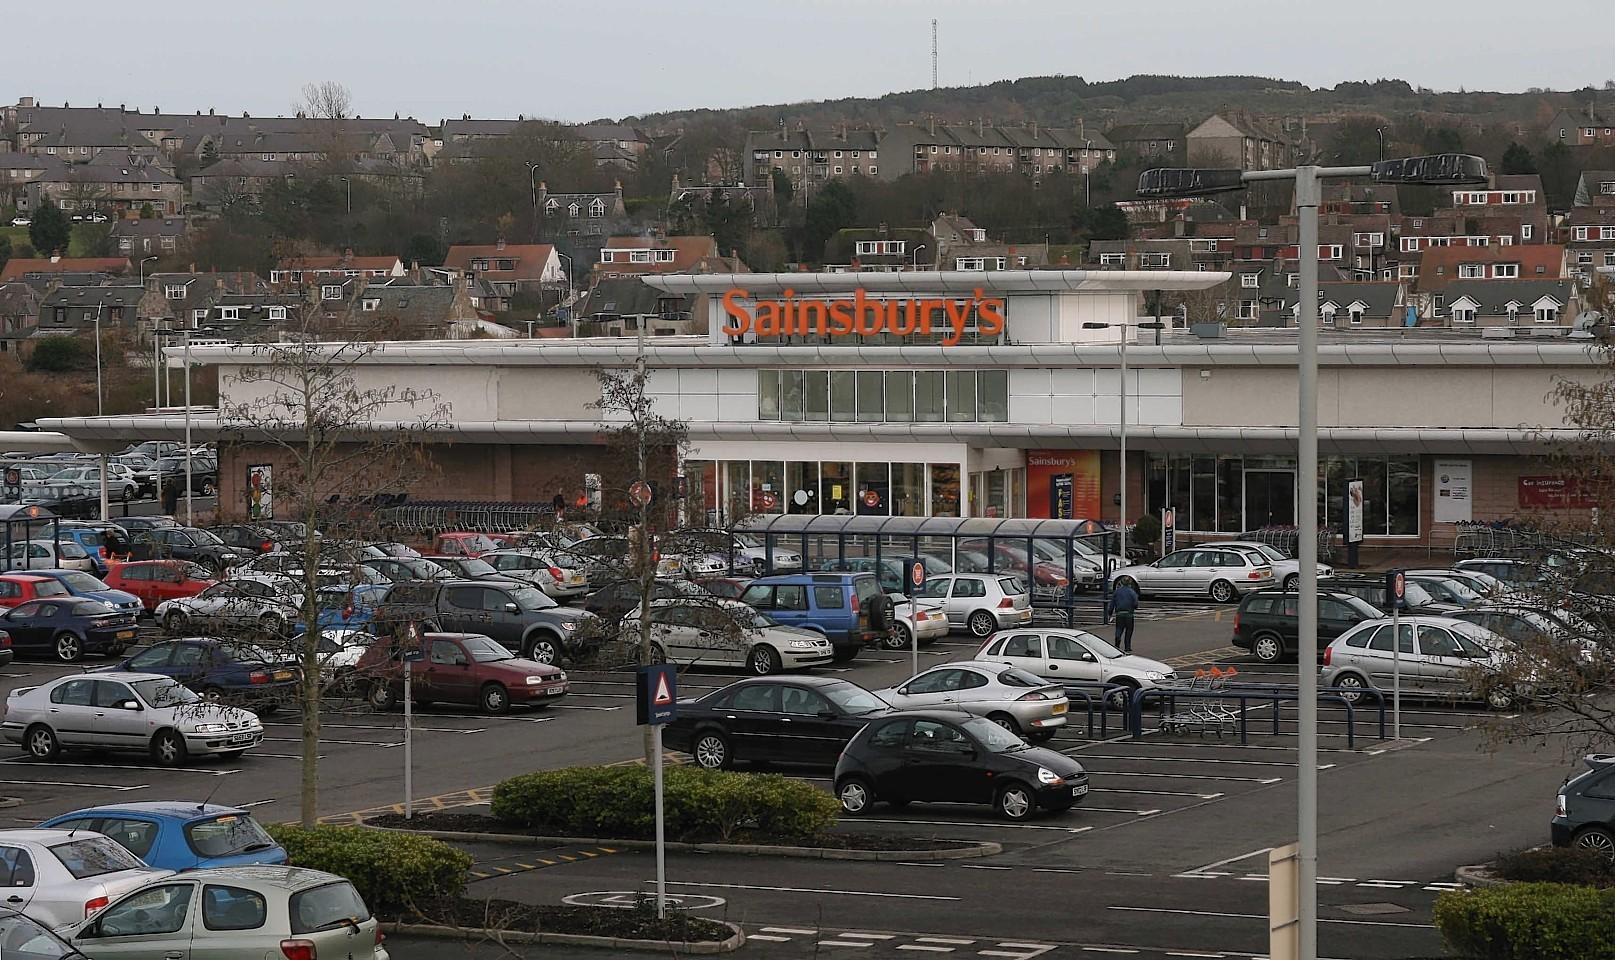 The cars were parked near Sainsbury's in Garthdee